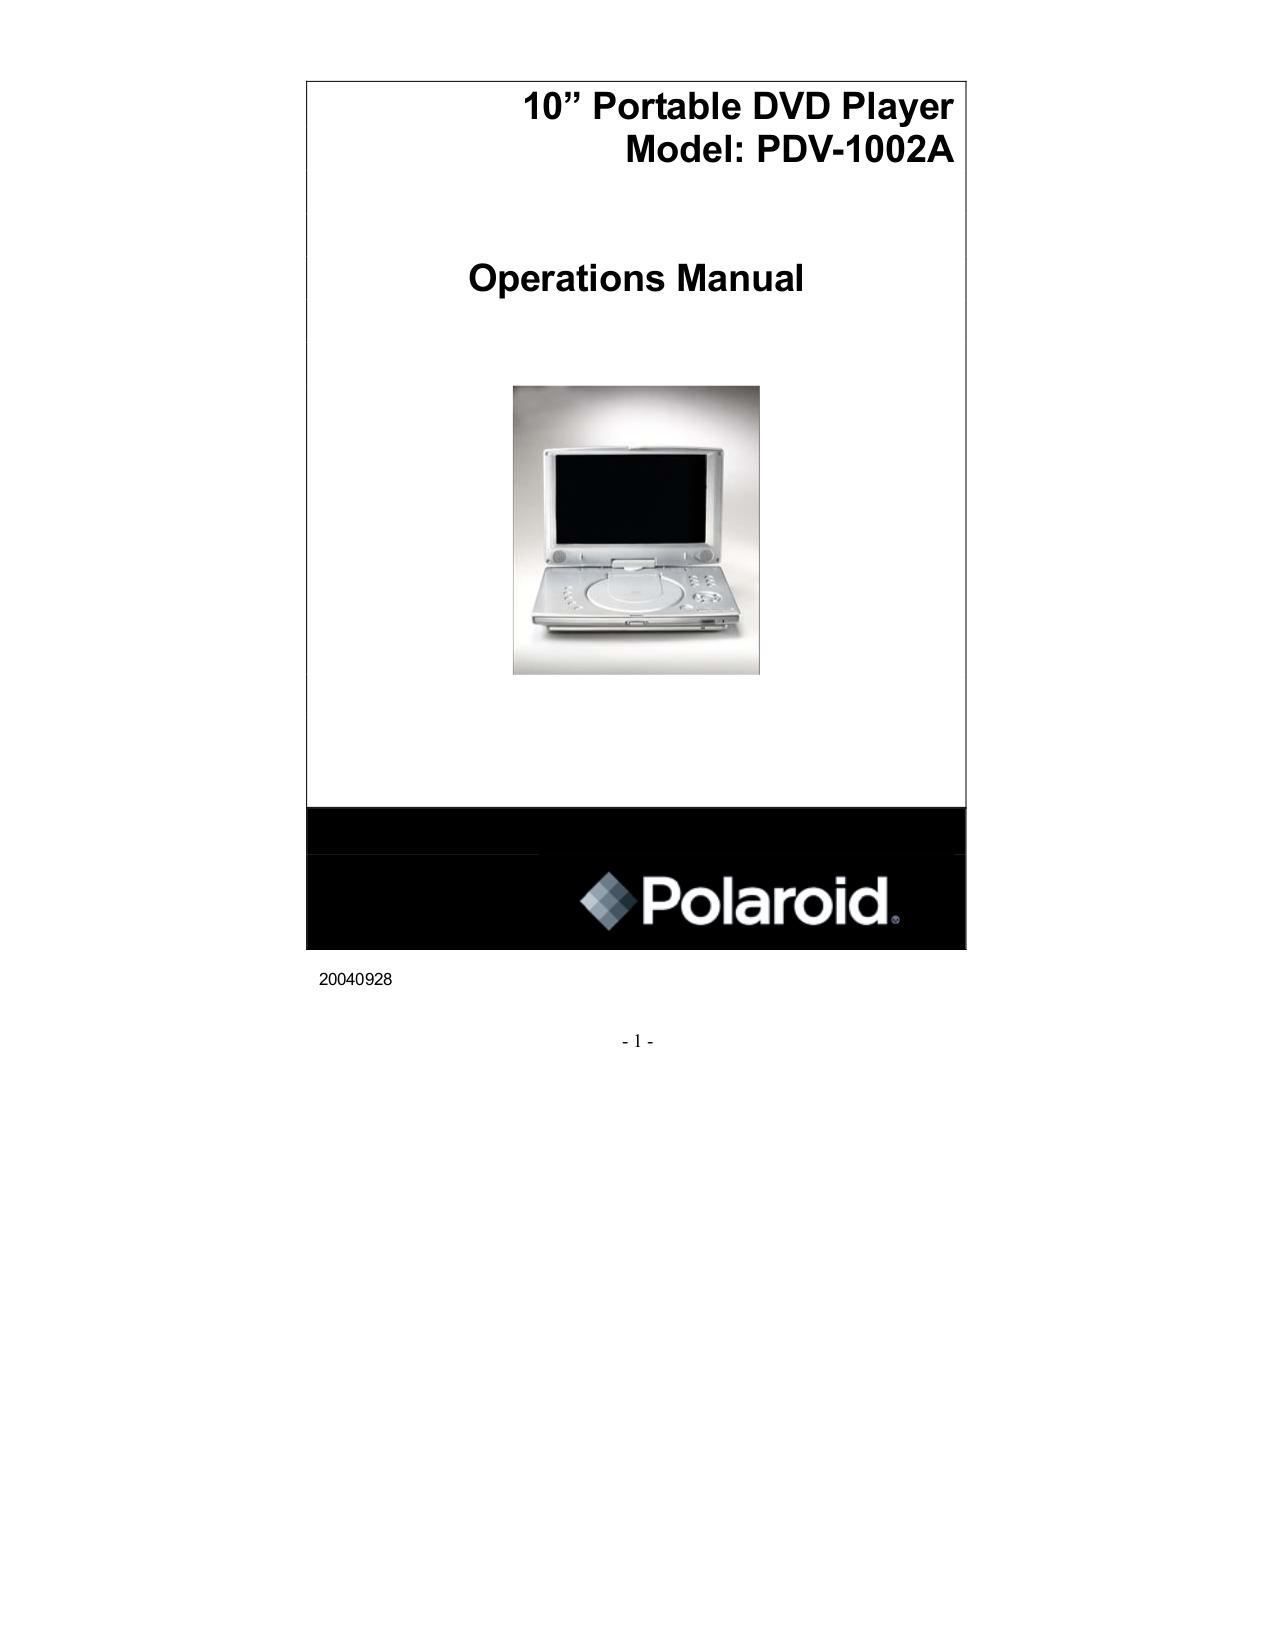 download free pdf for polaroid pdv 1002a portable dvd player manual rh umlib com Polaroid Portable DVD Player Amazon CNET Top DVD Player Portable